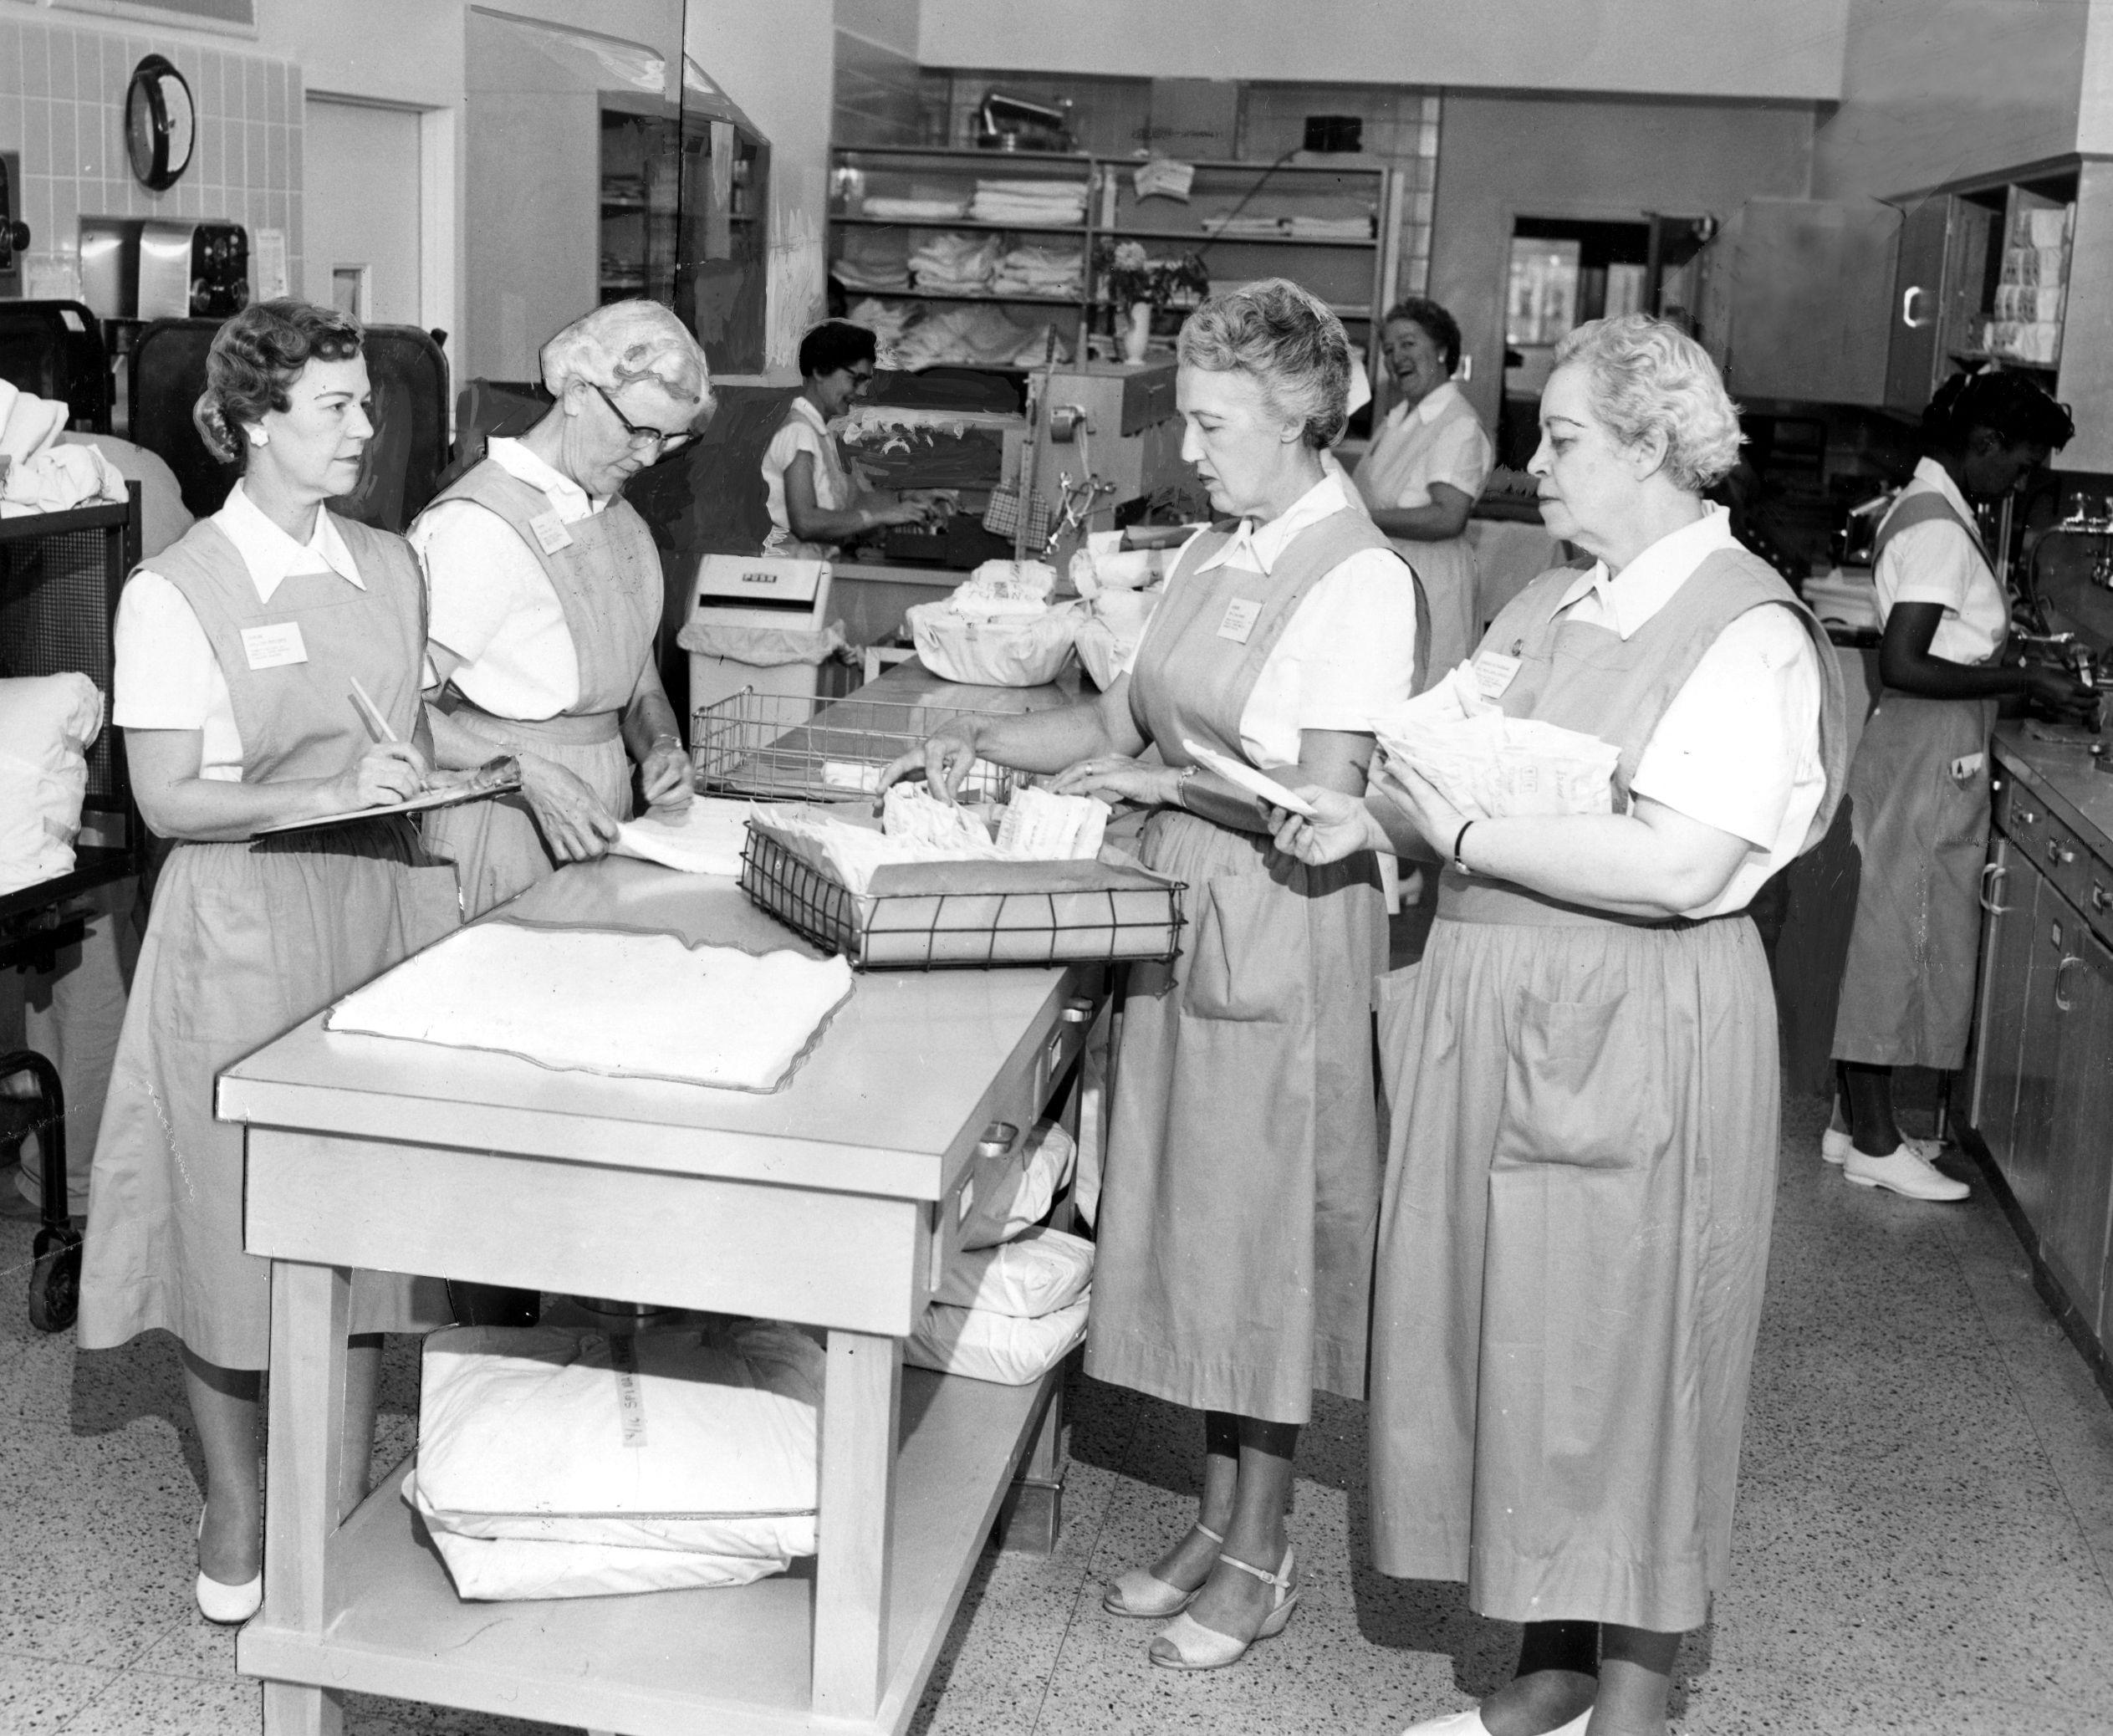 Mary moon volunteers 1962 medical services nursing